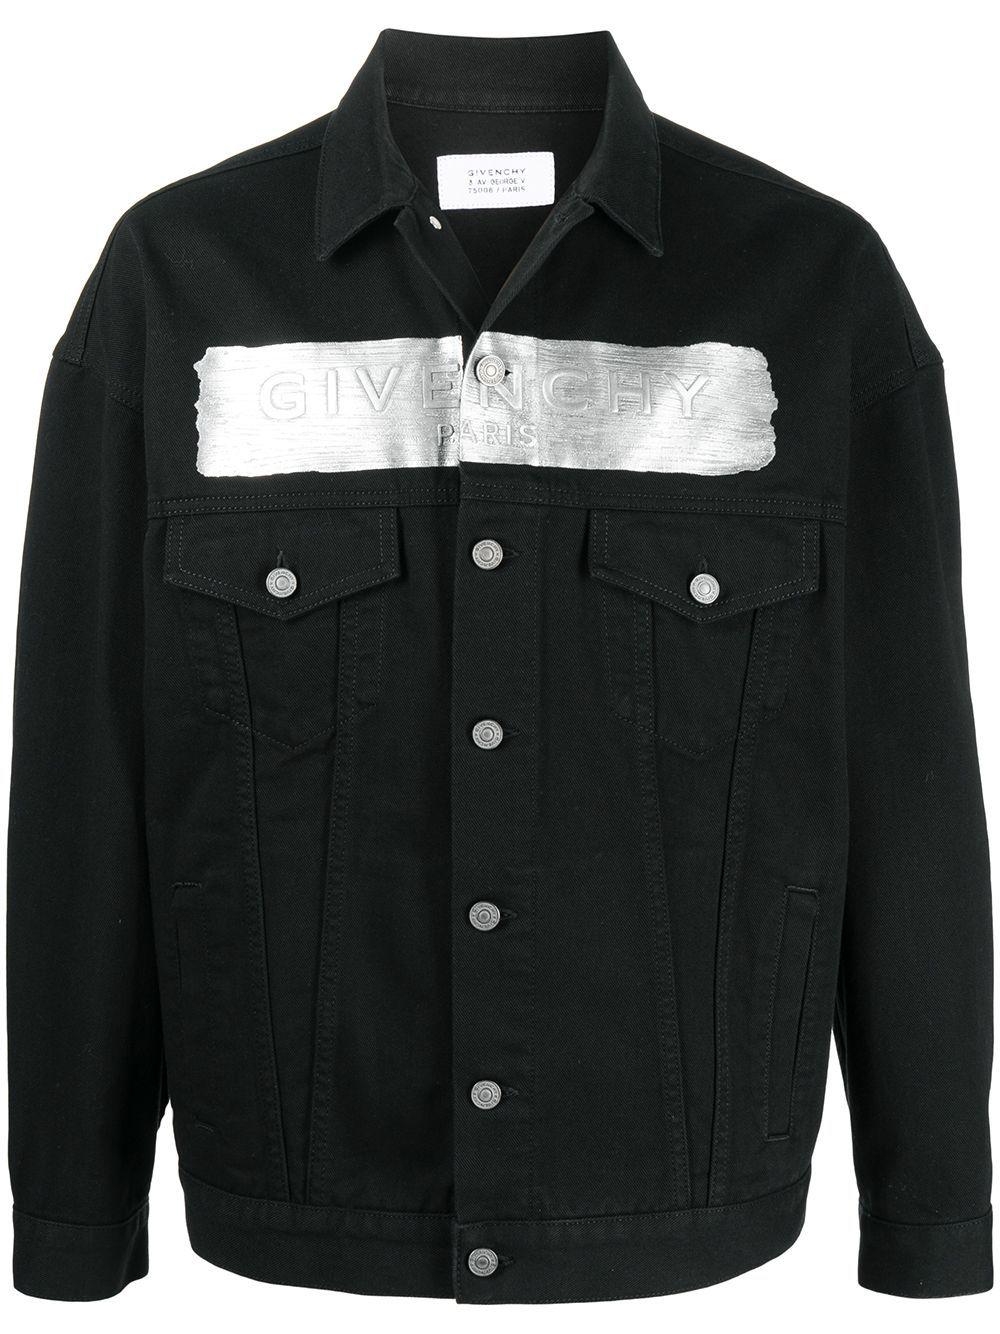 Givenchy GIVENCHY MEN'S BLACK COTTON JACKET